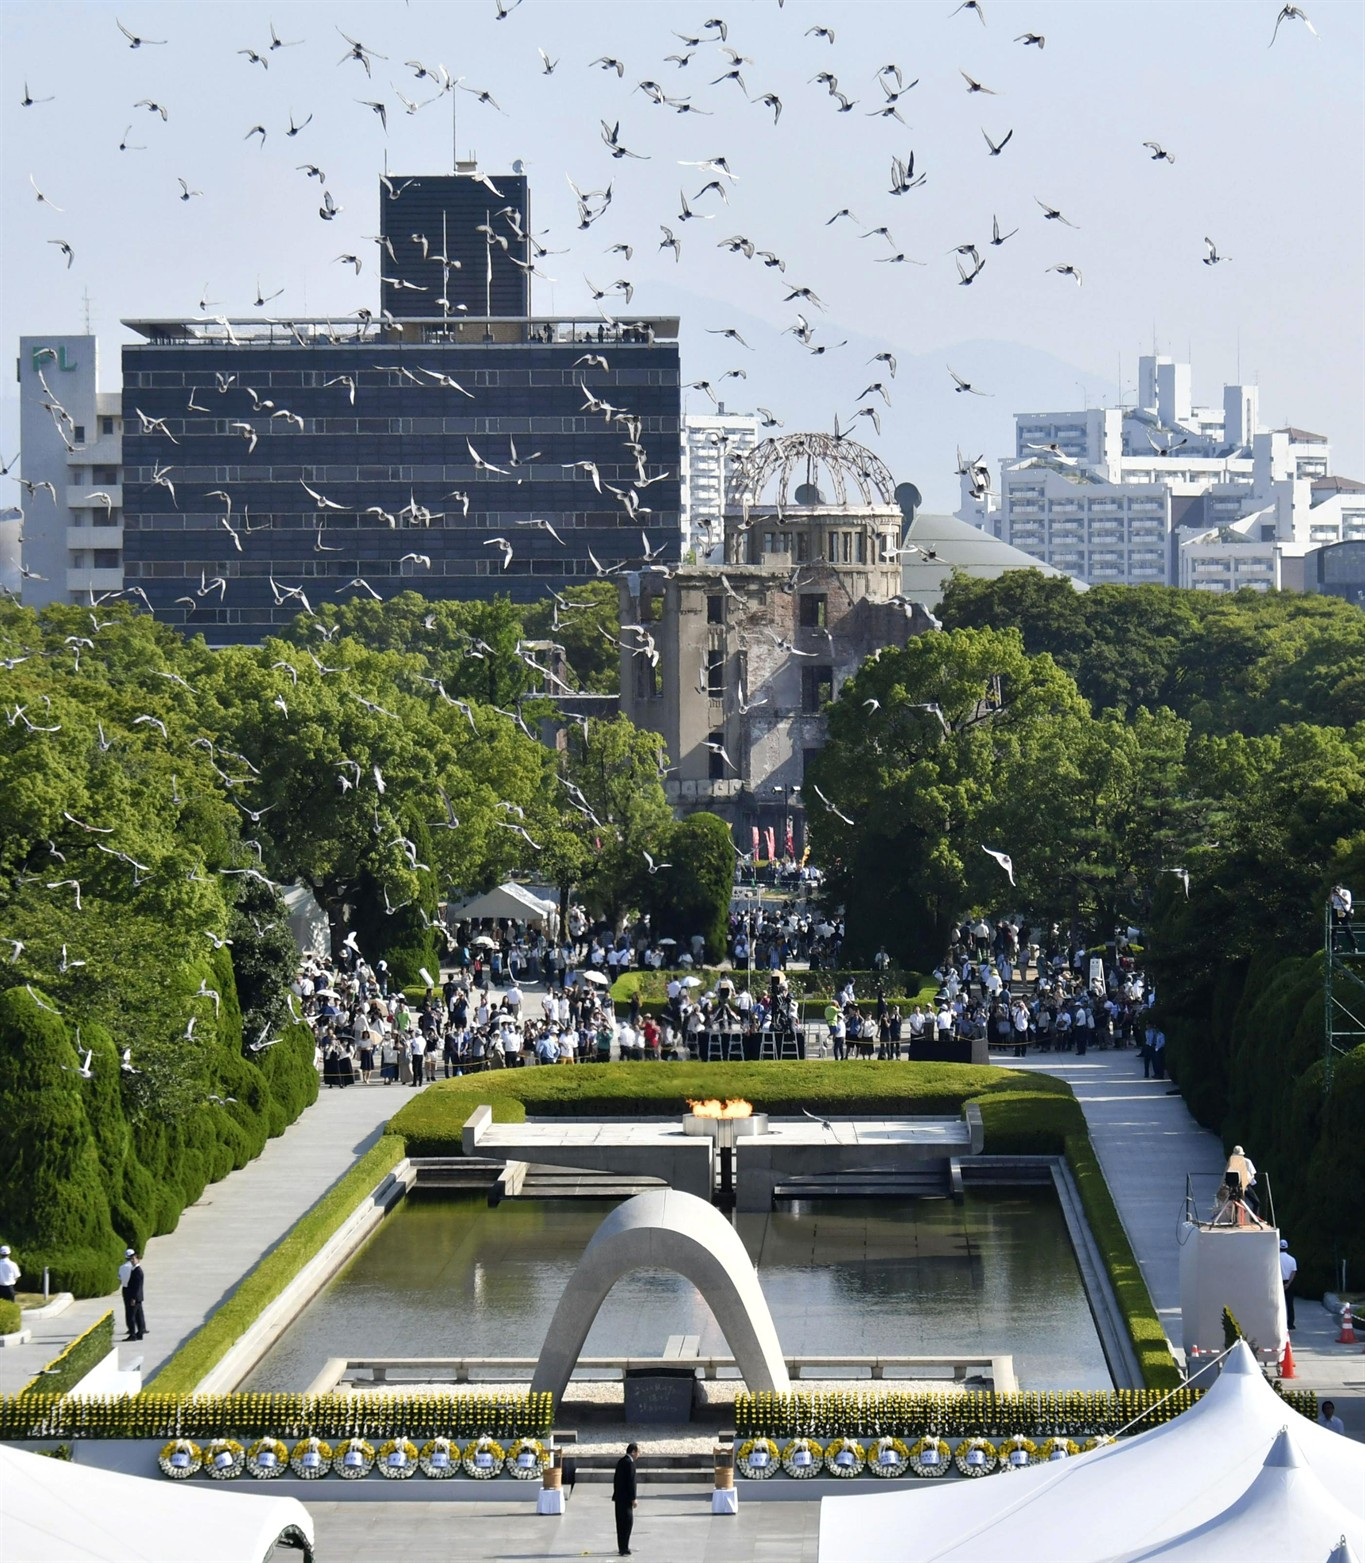 Japanese students use virtual reality to recreate Hiroshima bombing